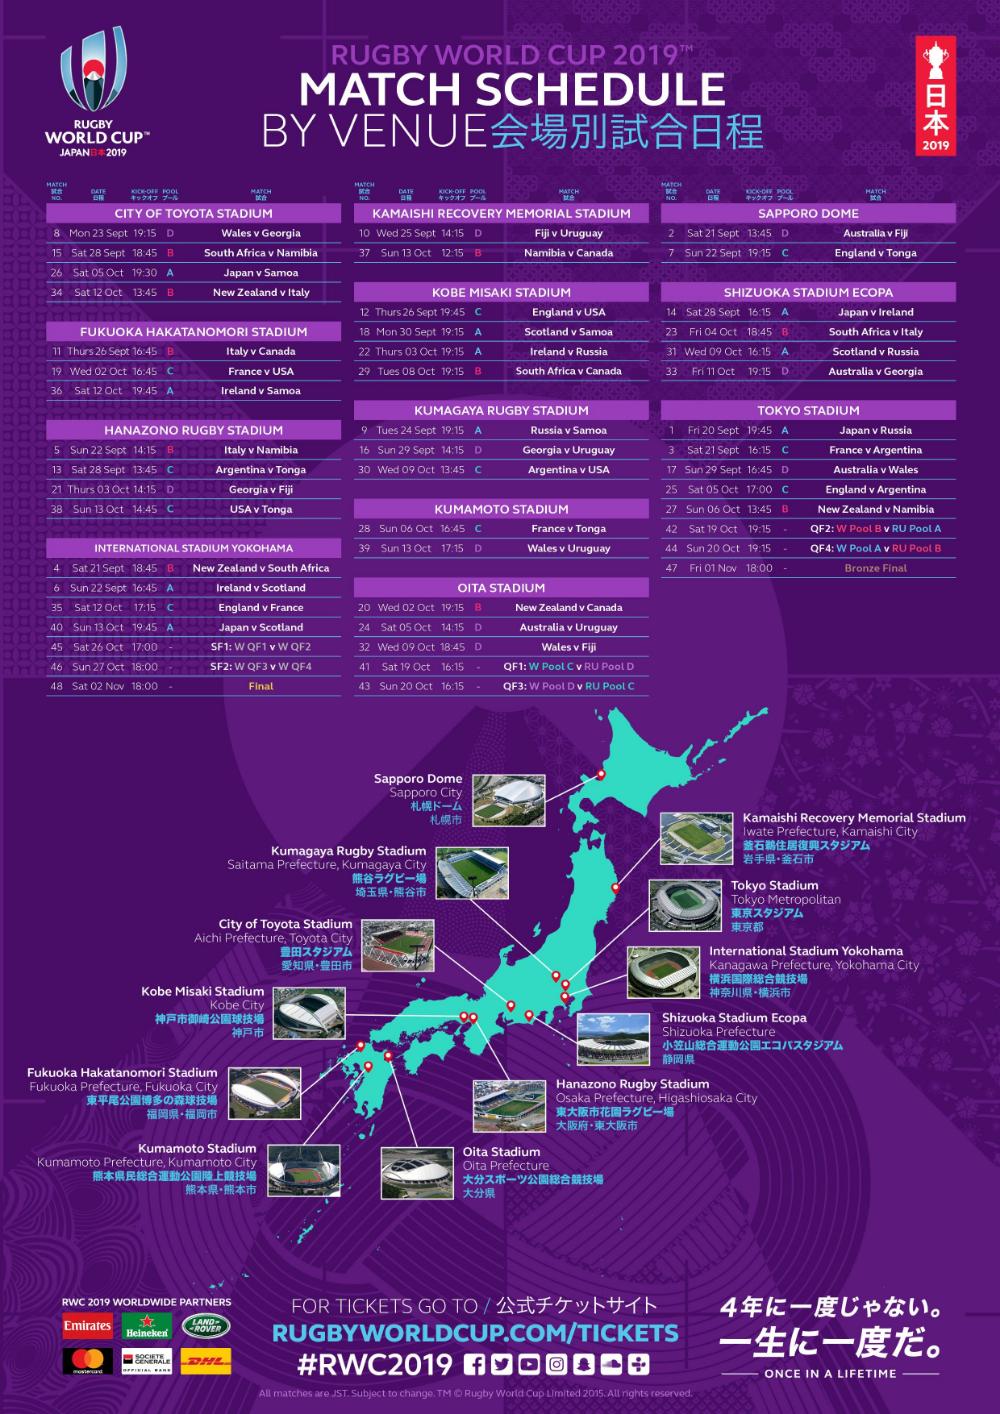 Rwc 2019 Match Schedule Rugby World Cup Rugbyworldcup Com Rugby World Cup World Cup Match World Cup